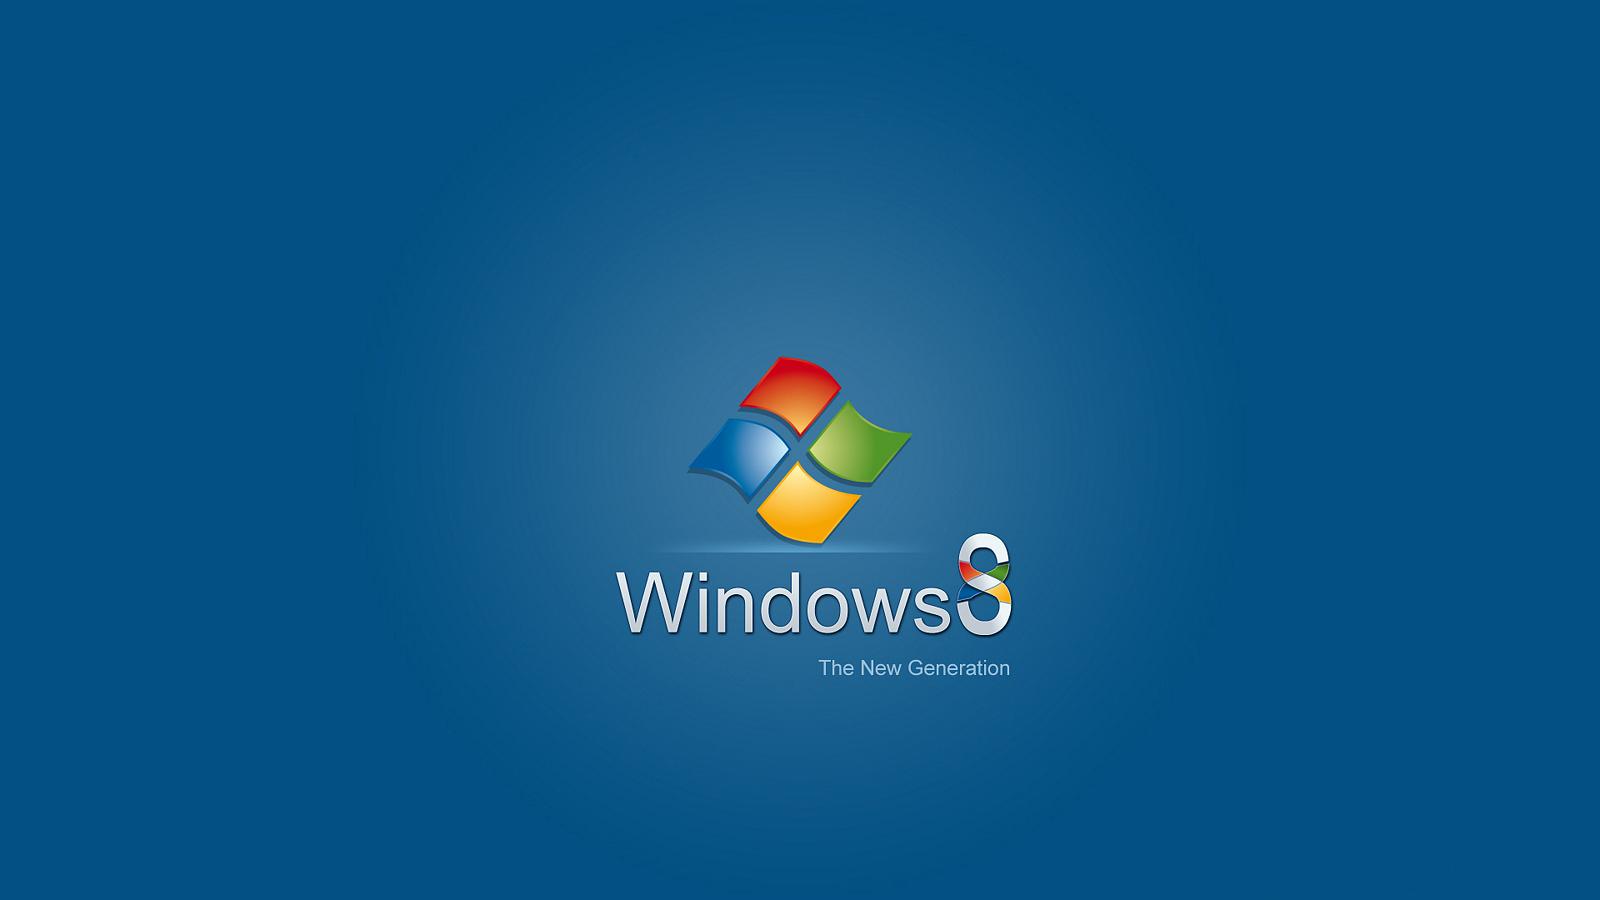 http://2.bp.blogspot.com/-u2T9bU2FTMI/UDJr6NE619I/AAAAAAAAAkQ/p49IUc_SQrQ/s1600/hd-donkerblauwe-windows-8-wallpaper-met-logo-en-blauwe-achtergrond.jpg